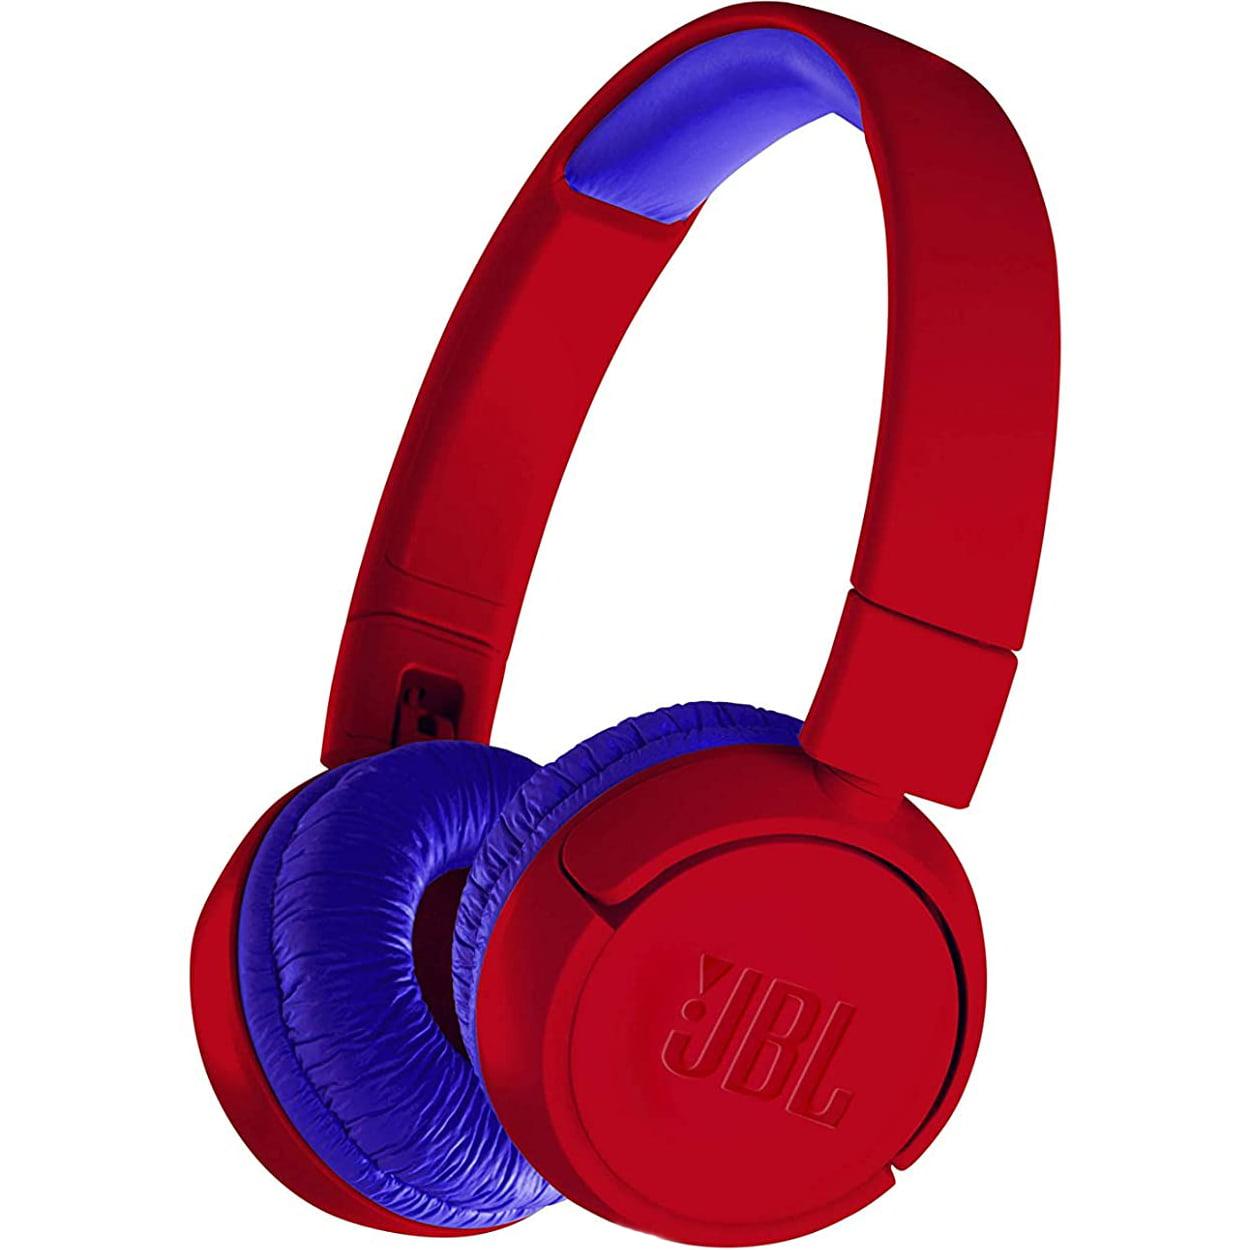 Casti audio On-Ear JBL JR300, Safe Sound, Bluetooth, Red